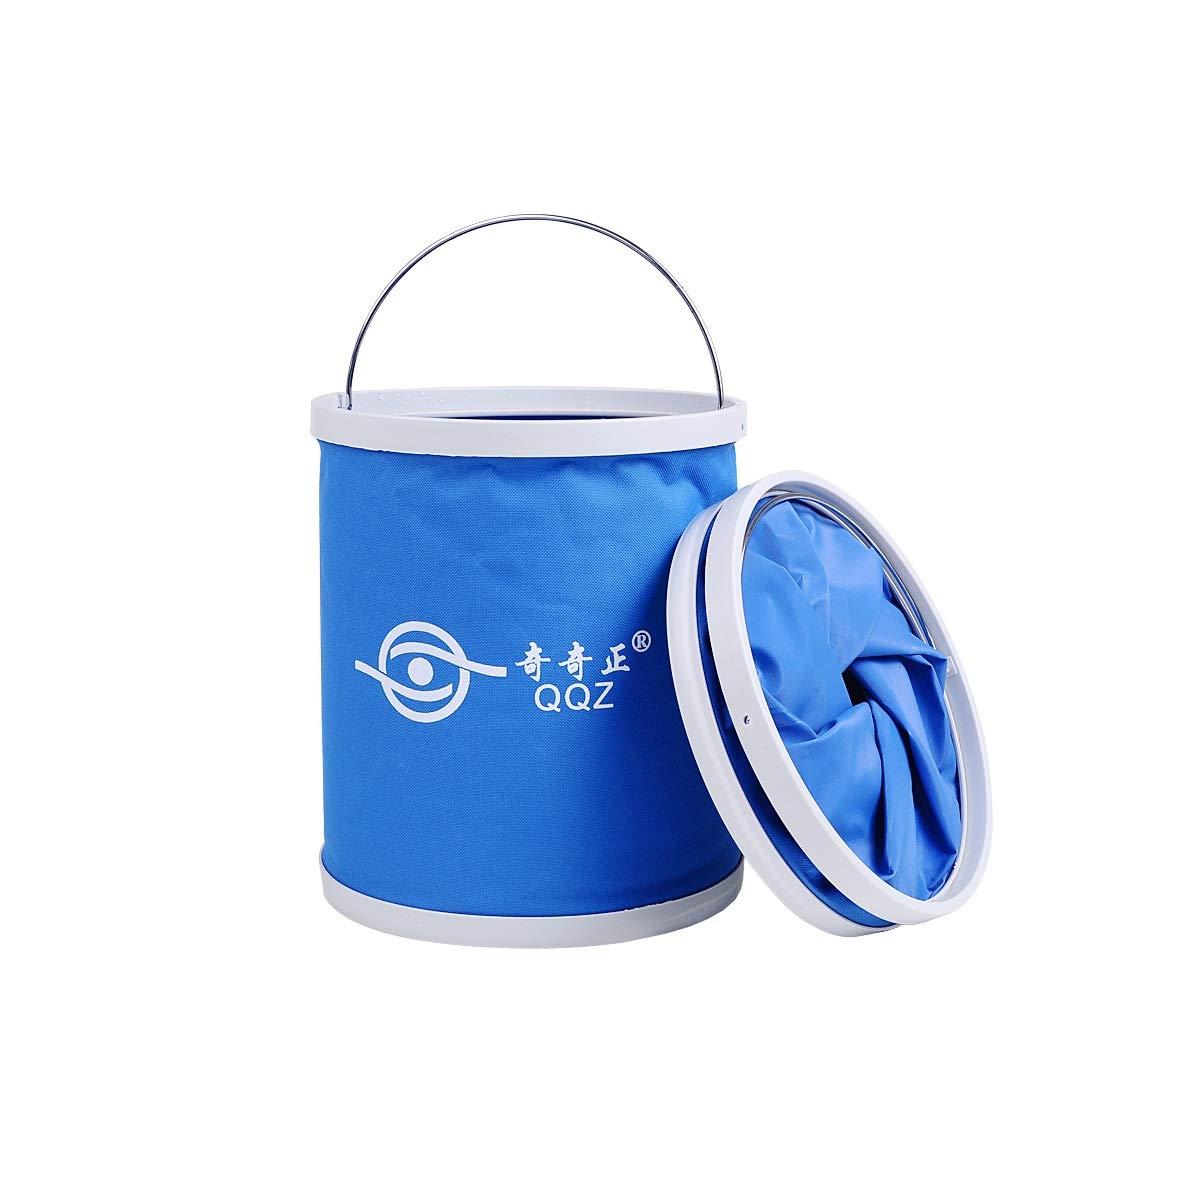 Muziwenju Portable Folding Bucket, 11L Collapsible Water Container wash Basin, Outdoor Travel, Camping, Hiking, car wash, Picnic, Fishing (Capacity : 11L, Color : Blue)